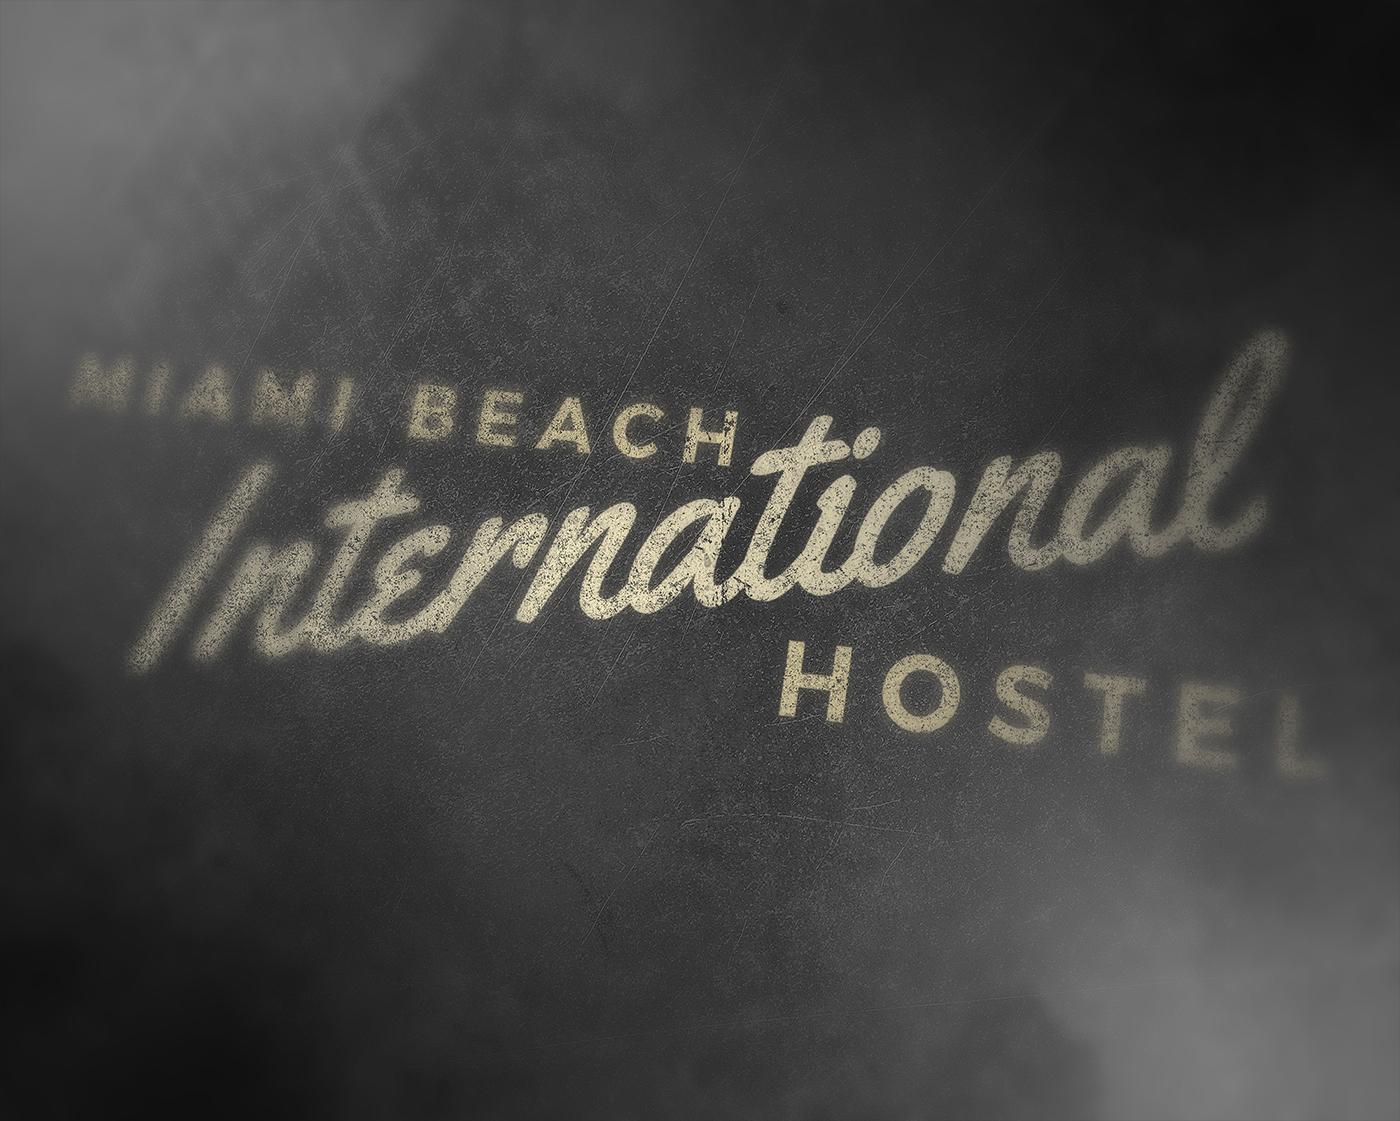 International Hostel – Branding